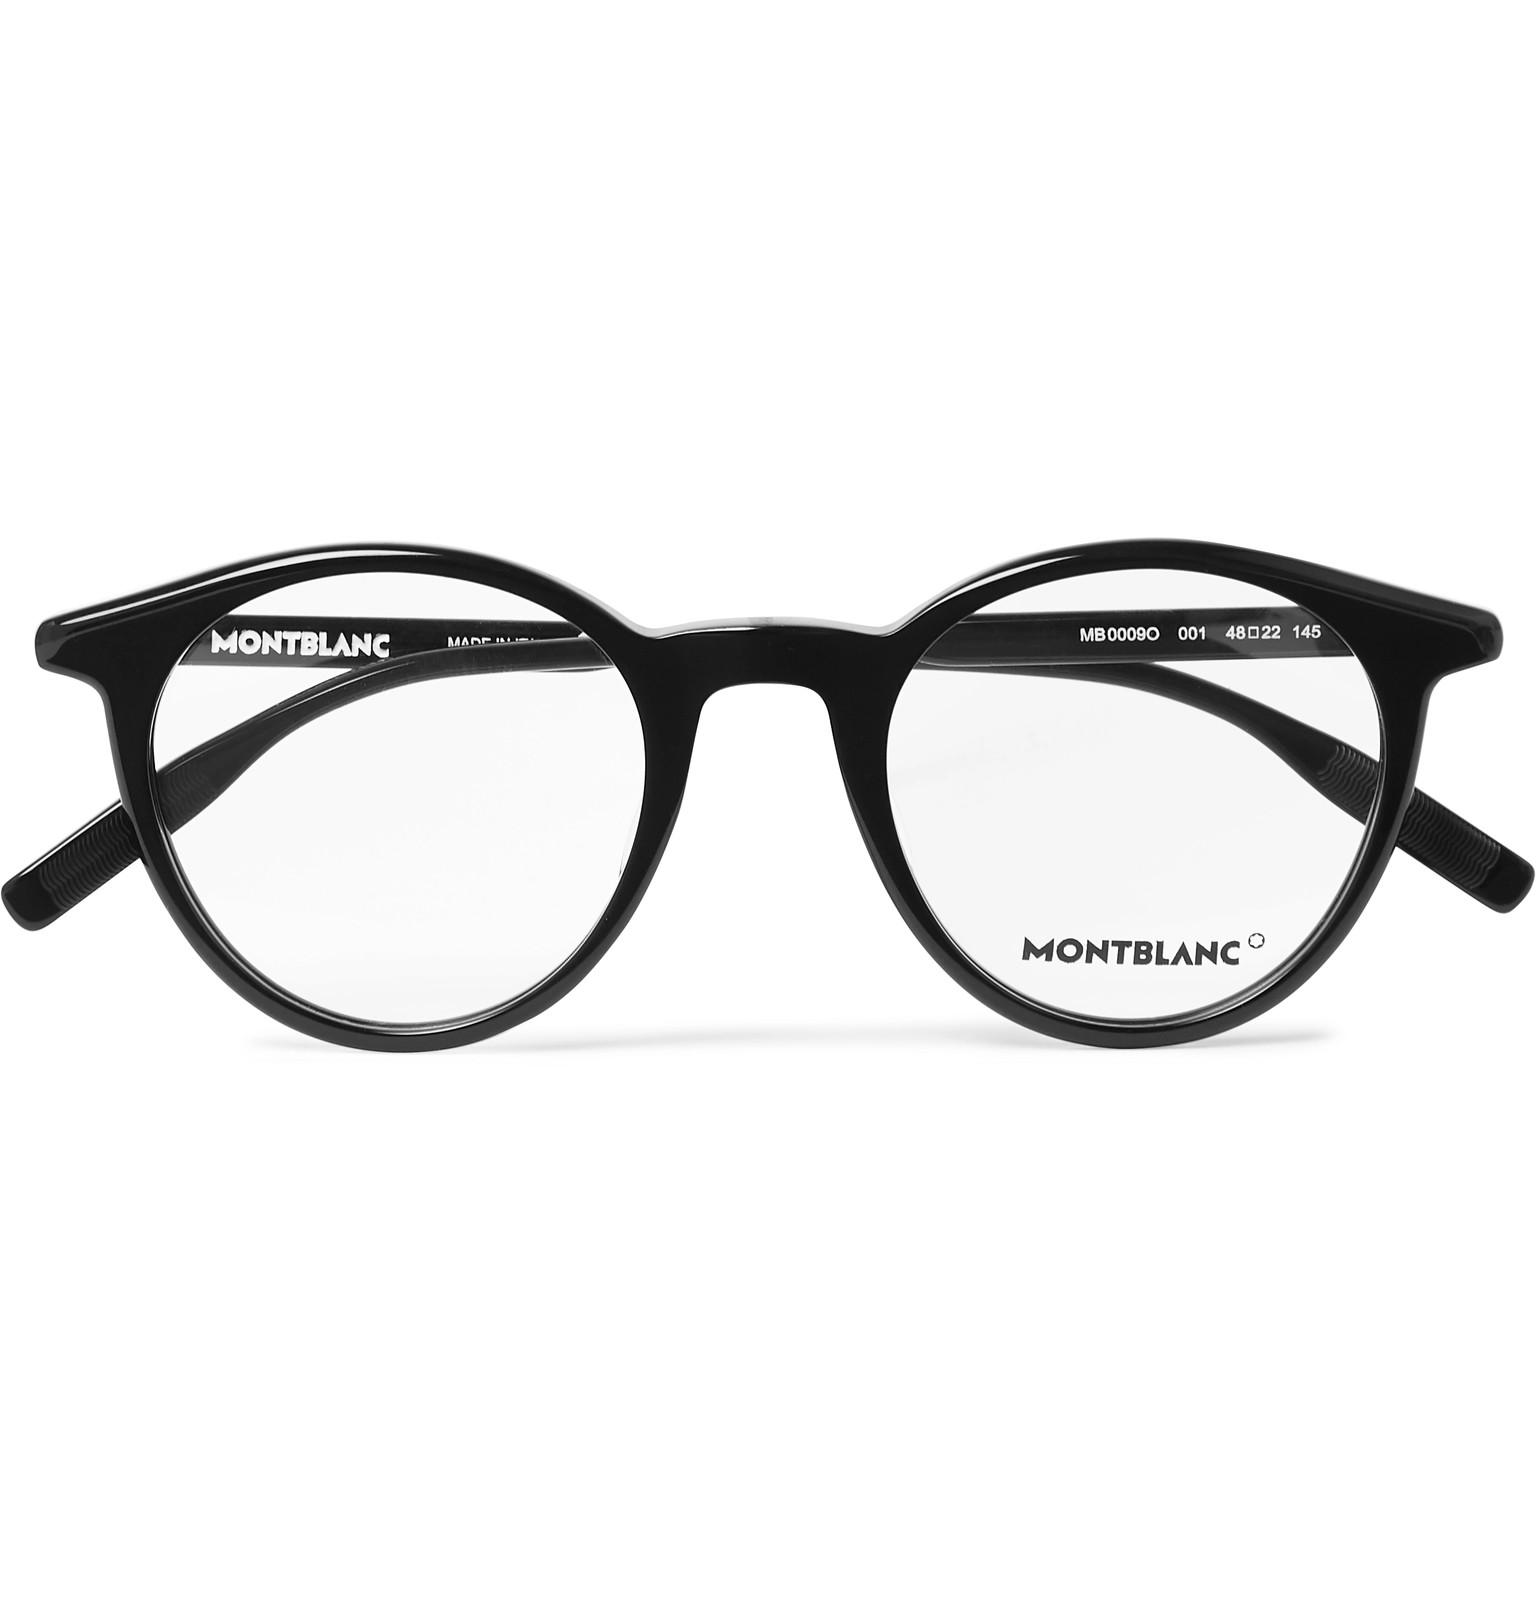 81b6e7bb0db0 Montblanc - Round-Frame Acetate Optical Glasses